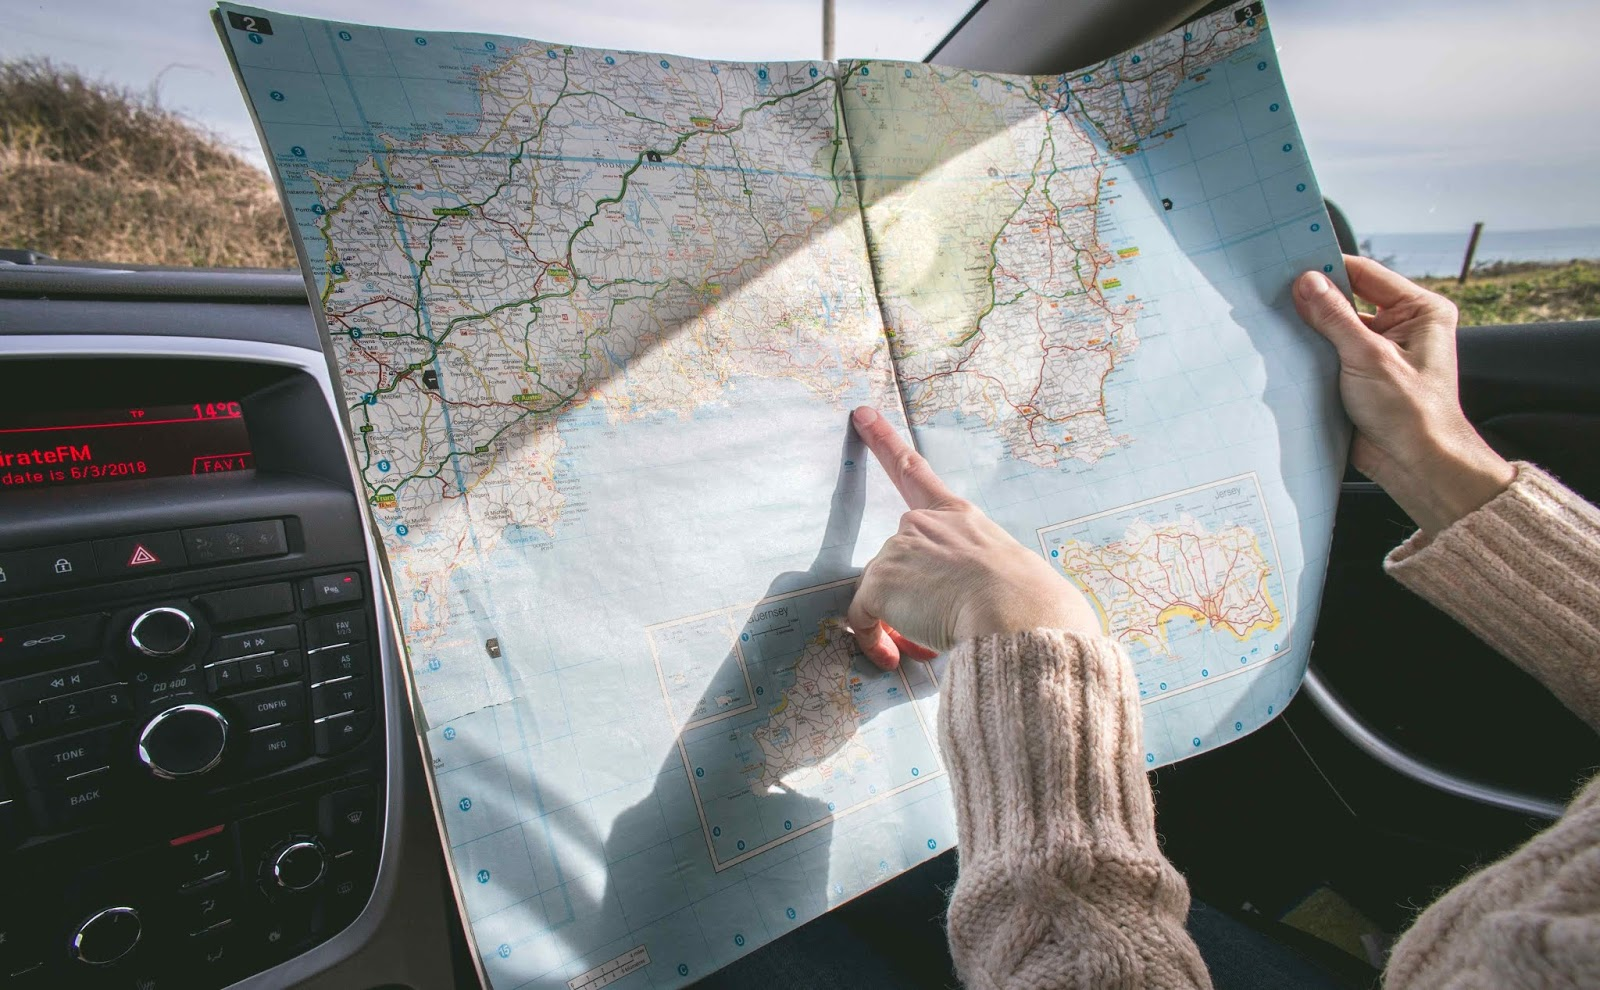 Australian Flyers – 5 Terrific Time Maximization Tips for Travel